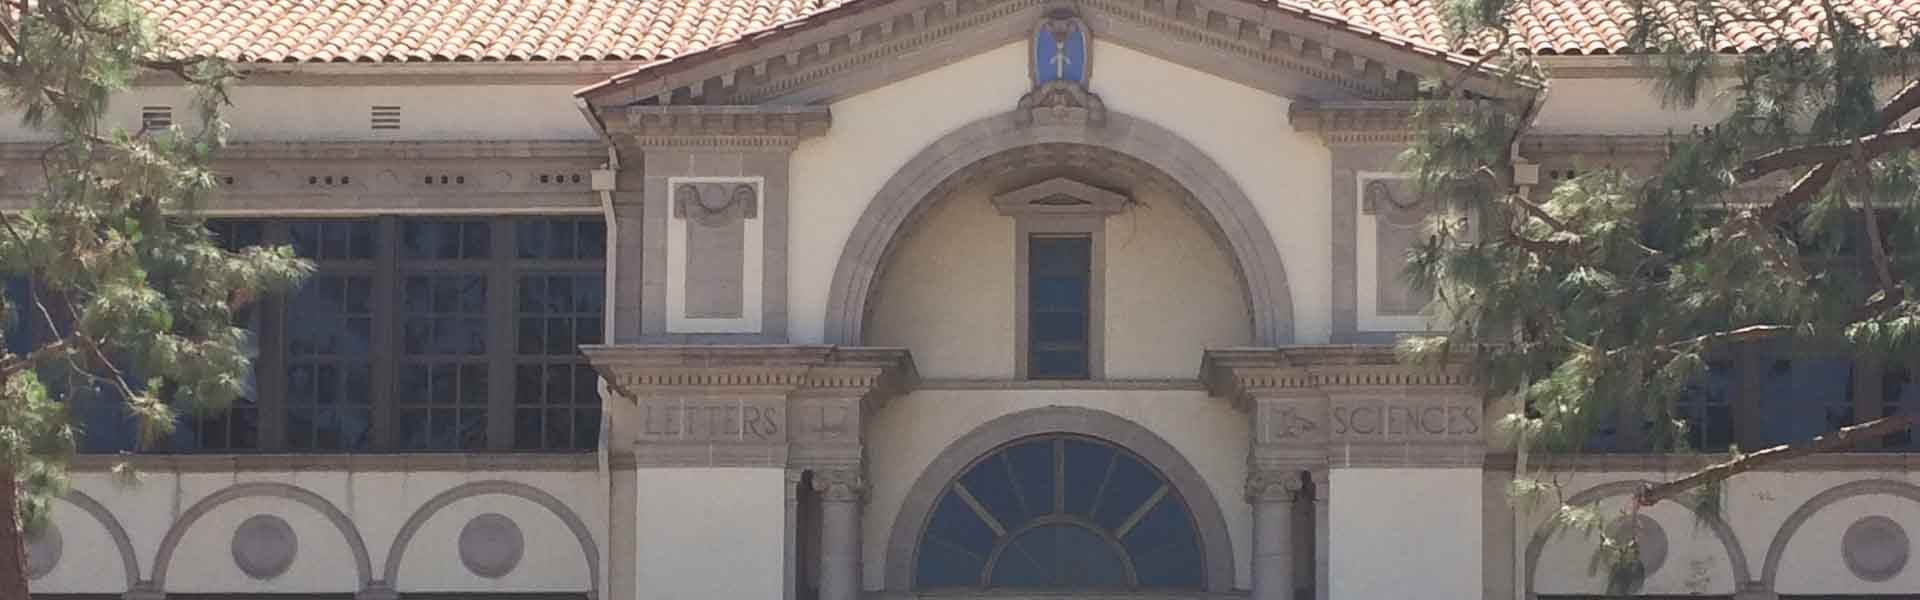 Torrance-Highschool-CA-FrontofSchool-Main-BAnner-US-2019